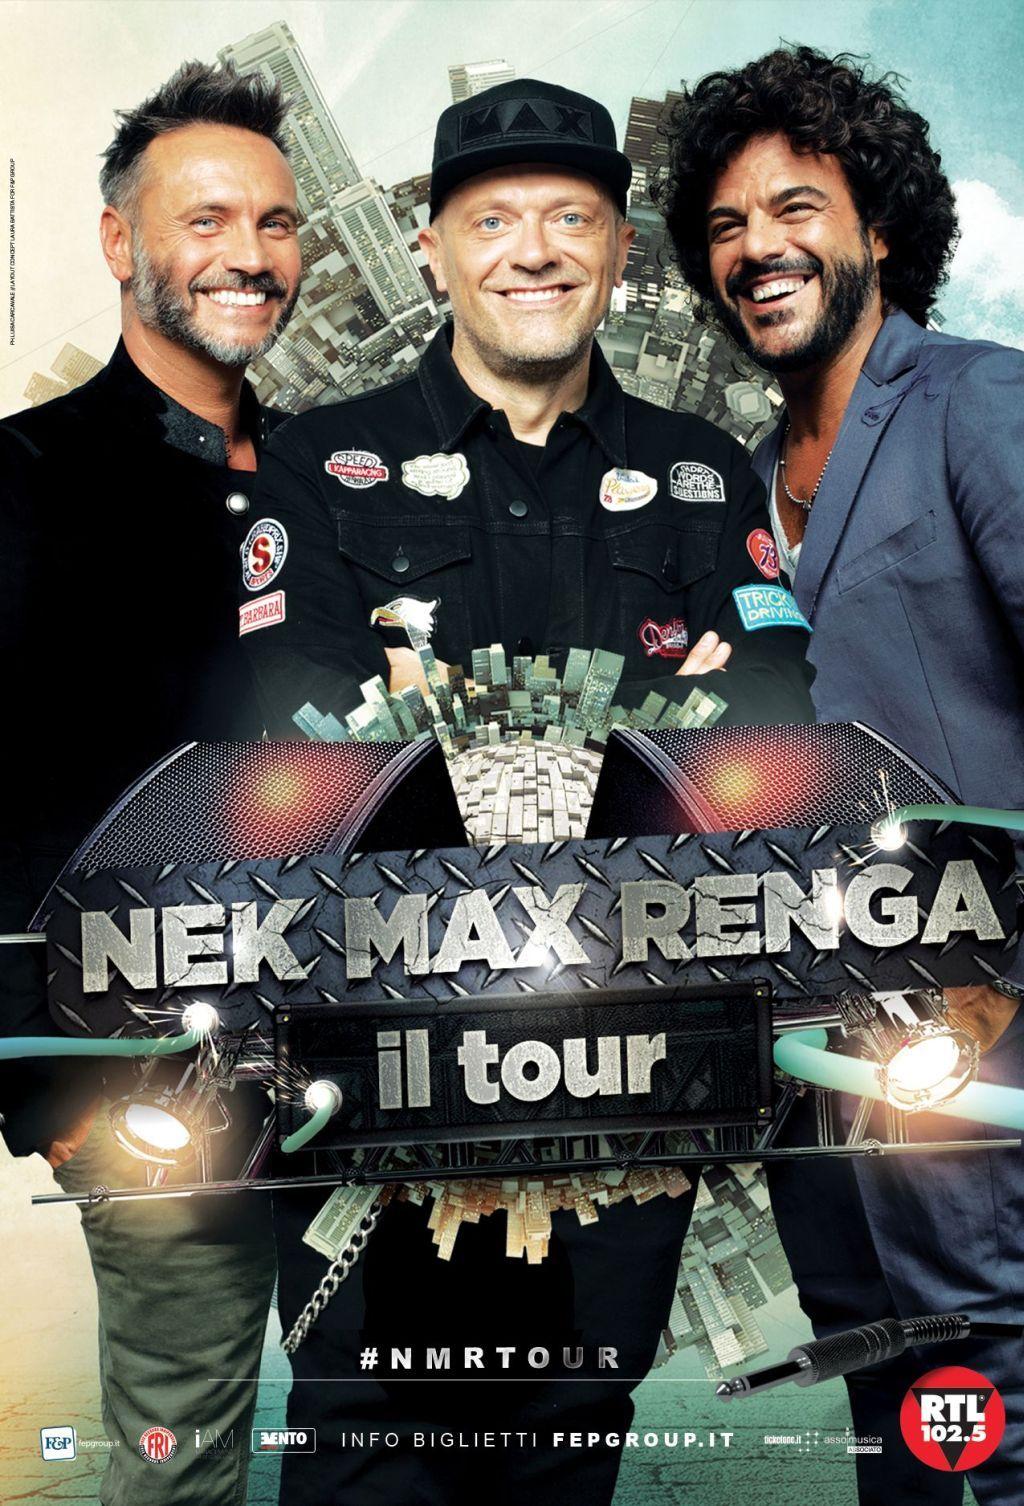 NEK-MAX-RENGA_locandina tour_M